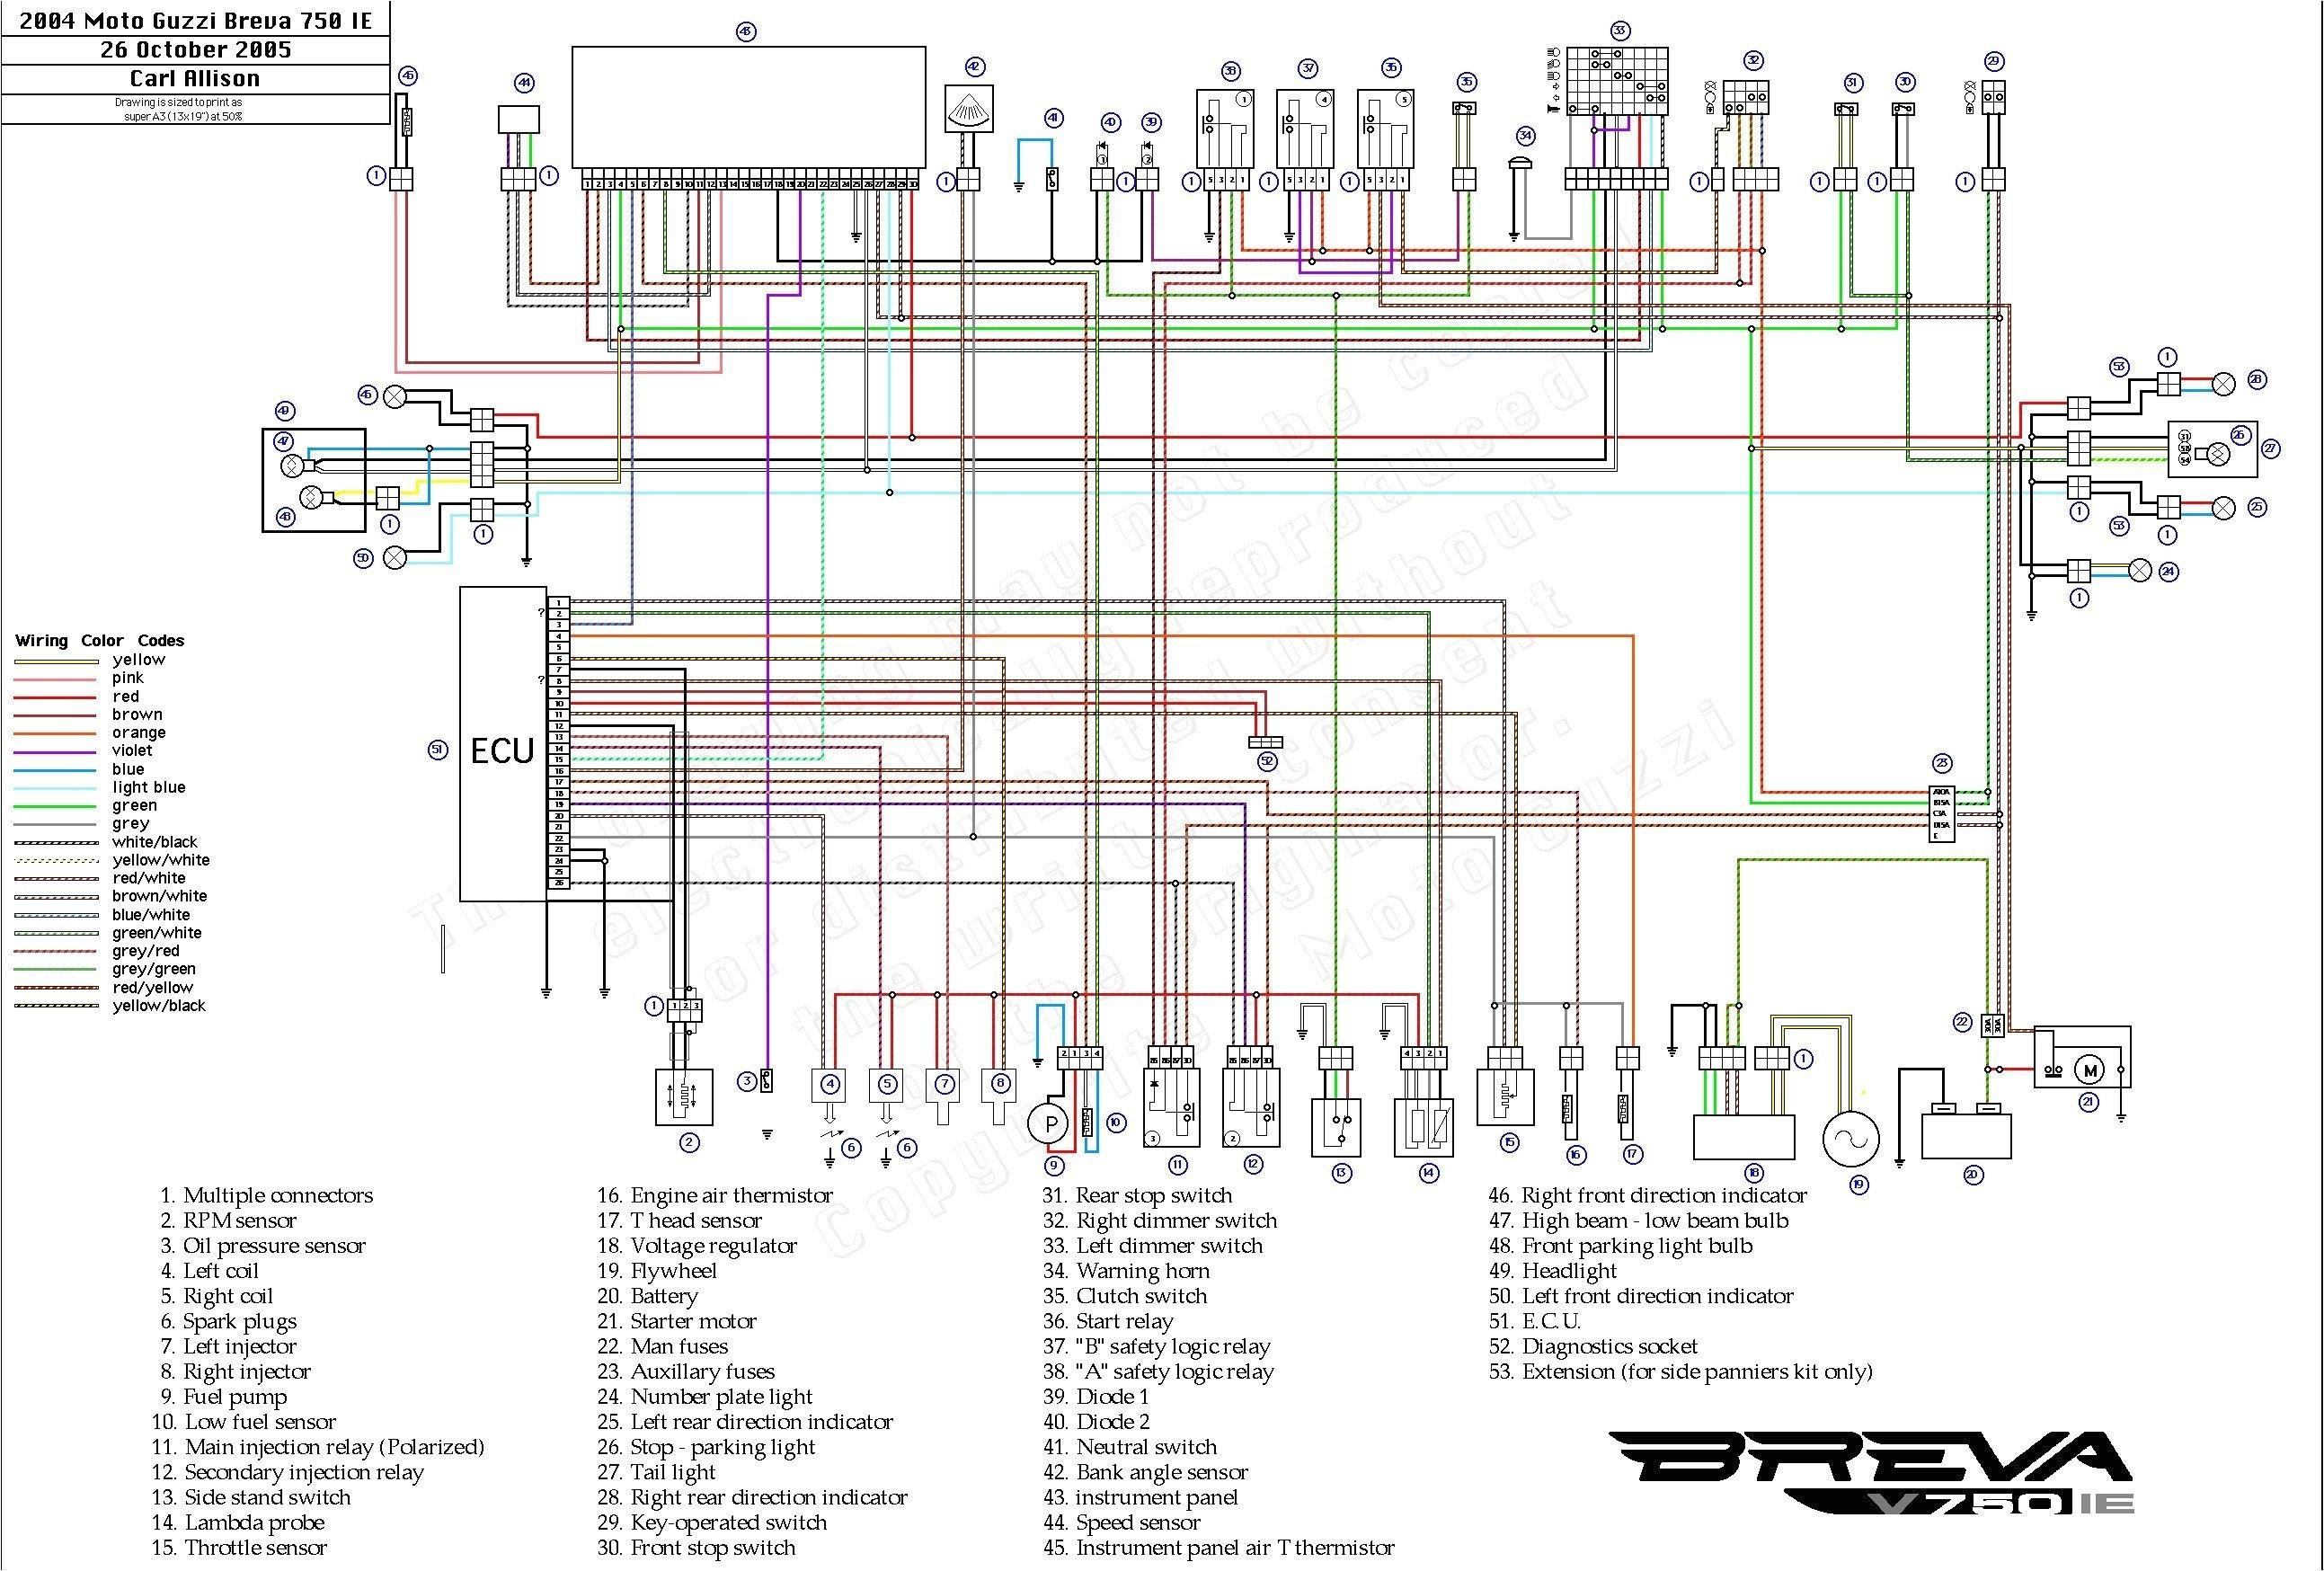 2004 dodge ram 1500 wiring diagram